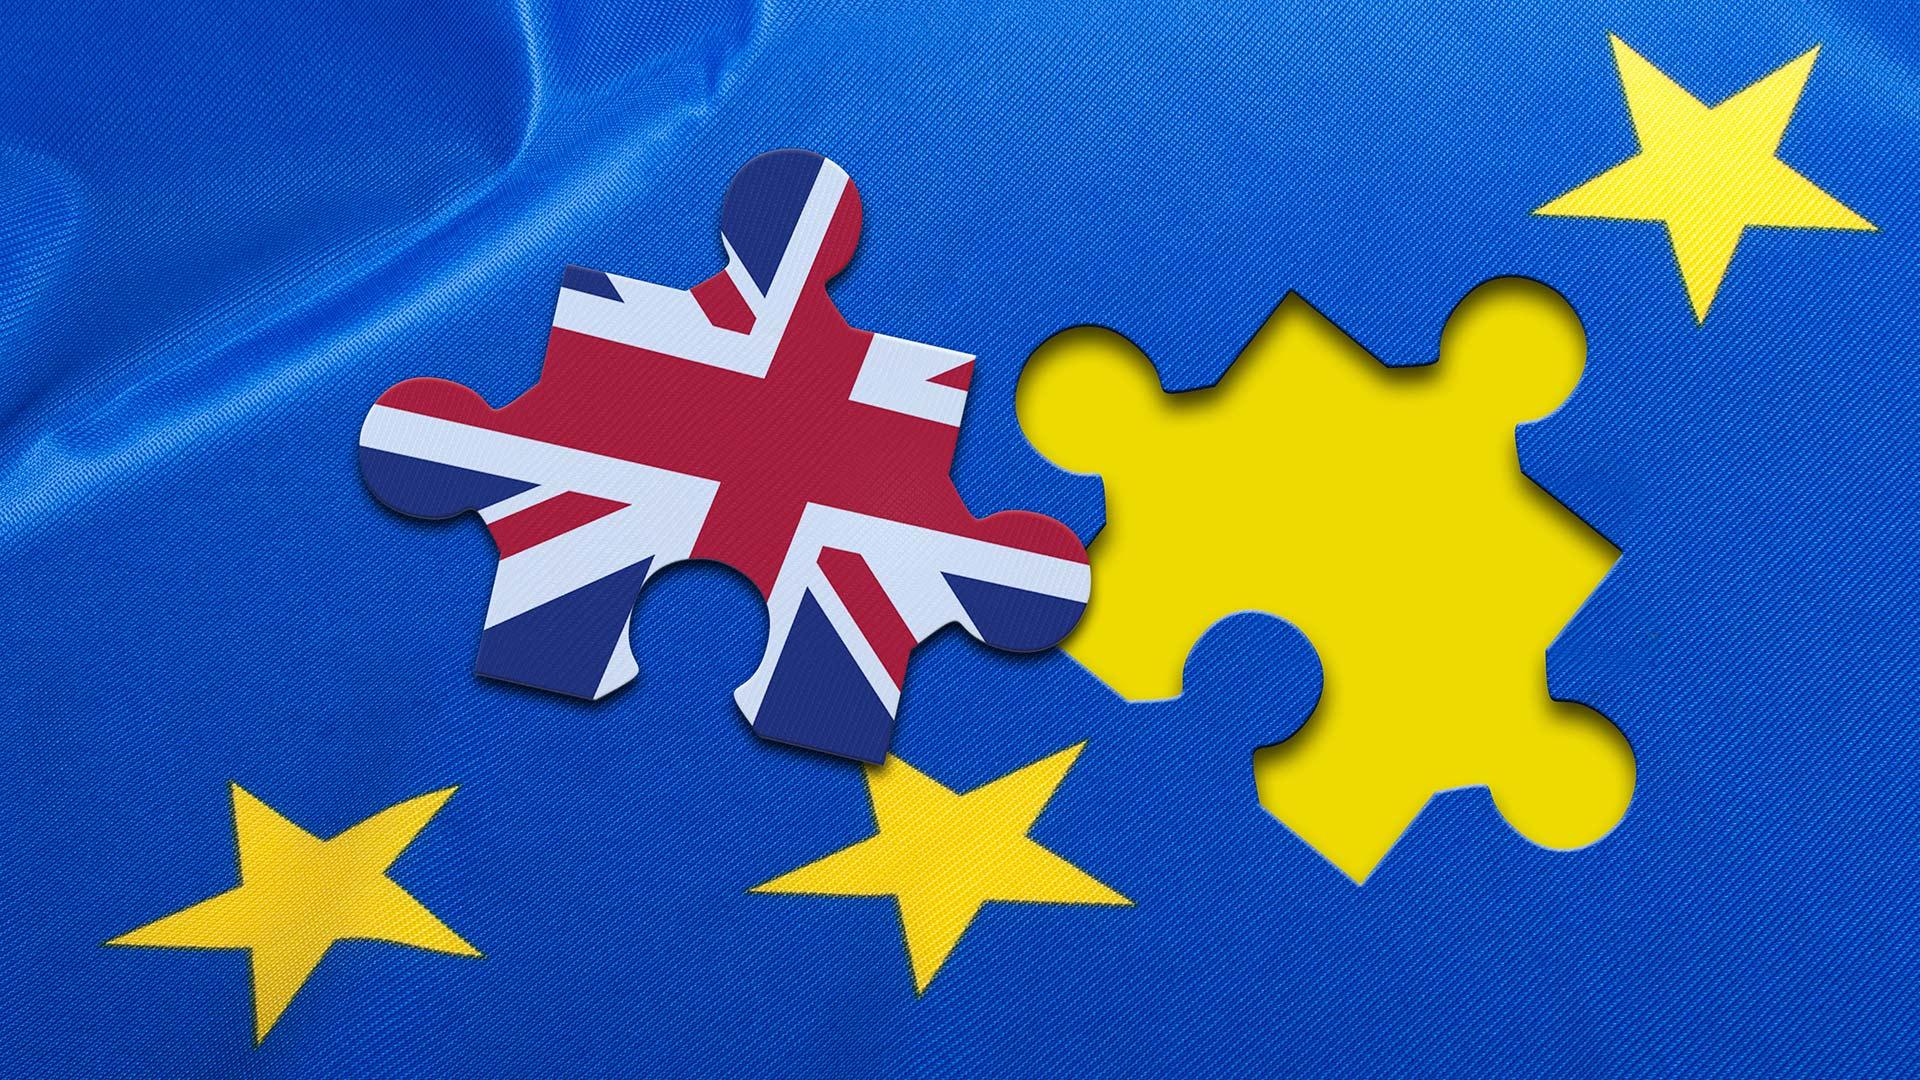 UK flag puzzle piece